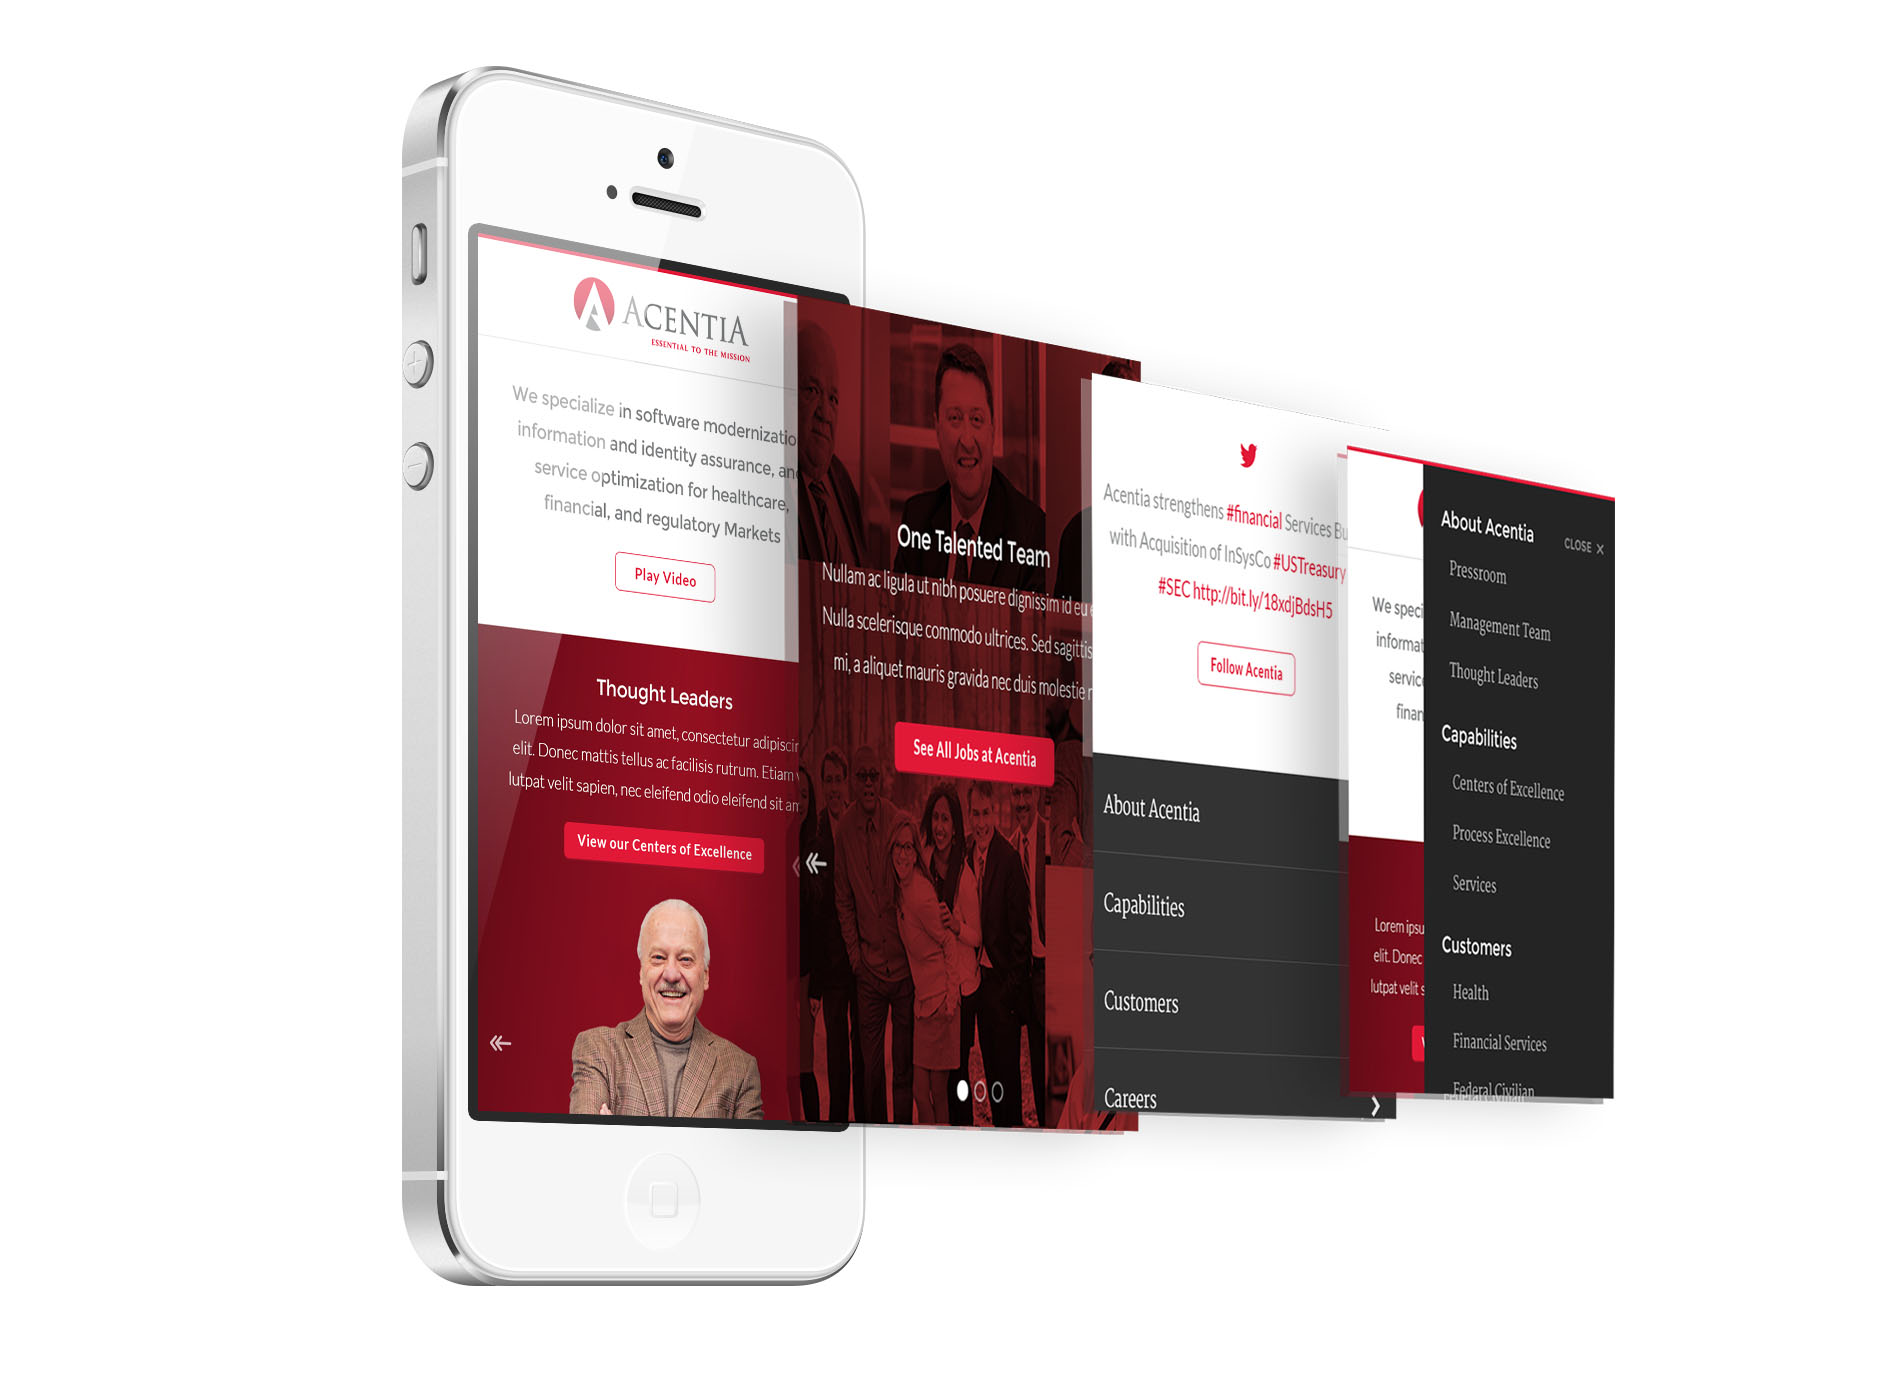 Acentia mobile design comps